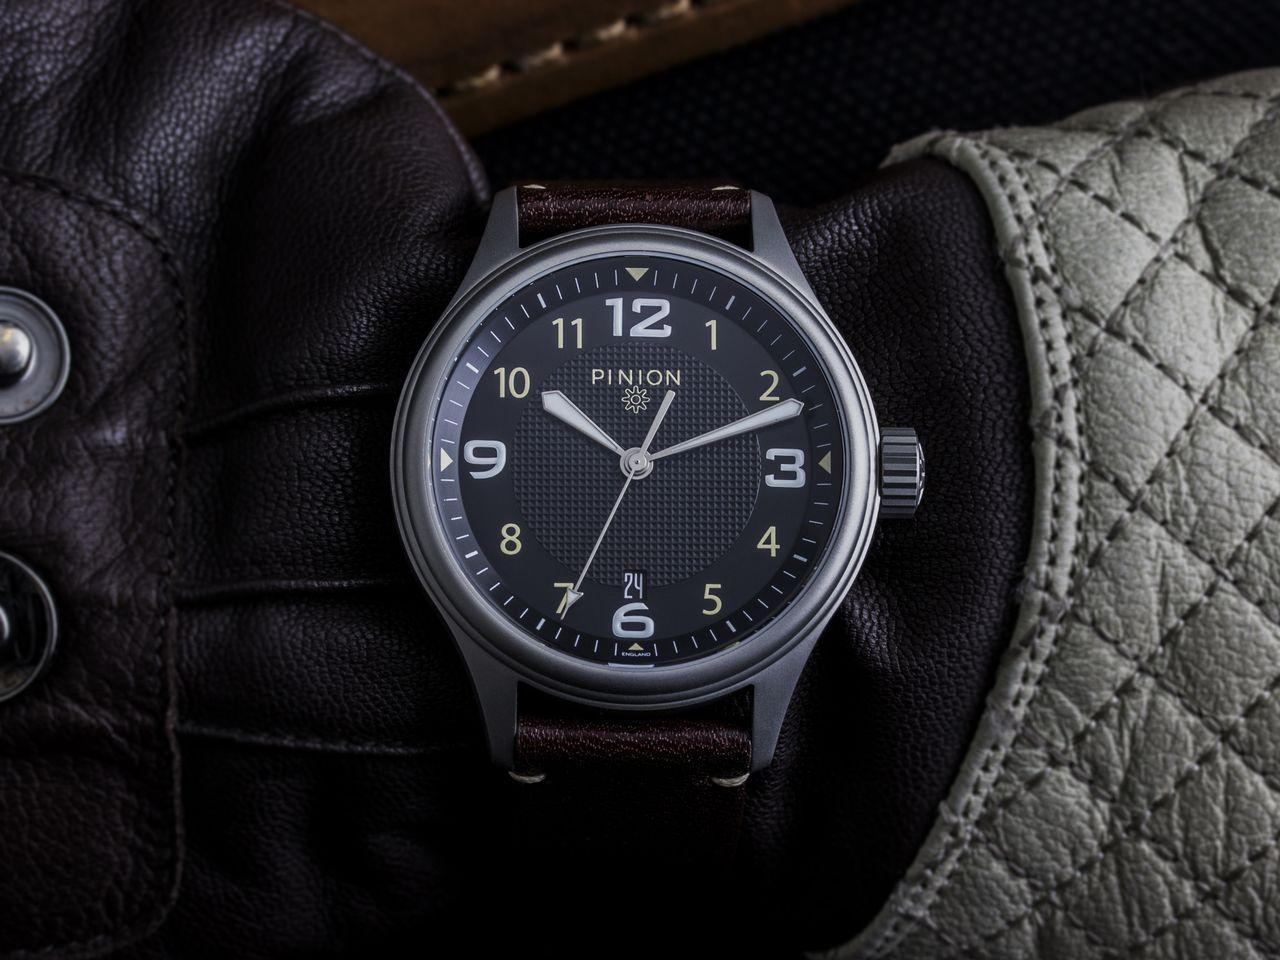 Pinion Atom V1 watch